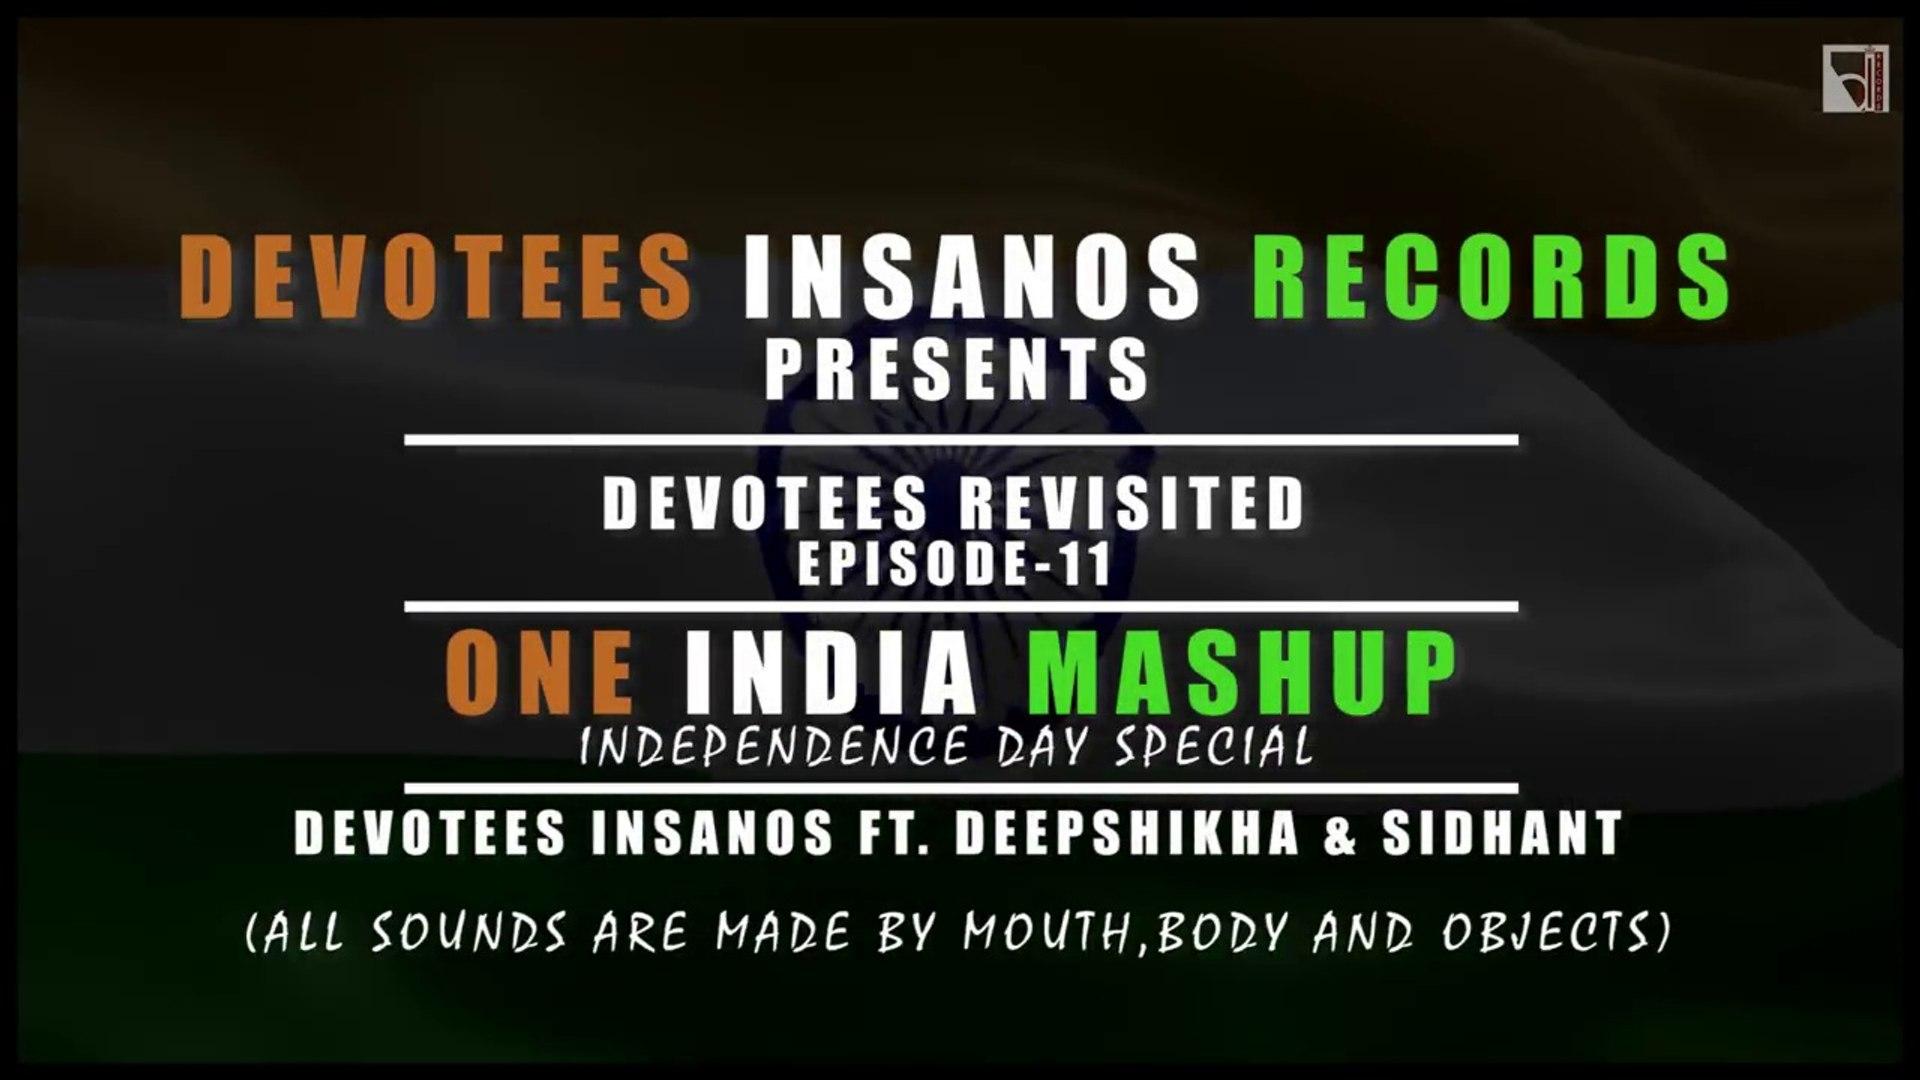 One India Mashup(20 Songs in 5 Min) _ Devotees Insanos ft Deepshikha 26  january spacile